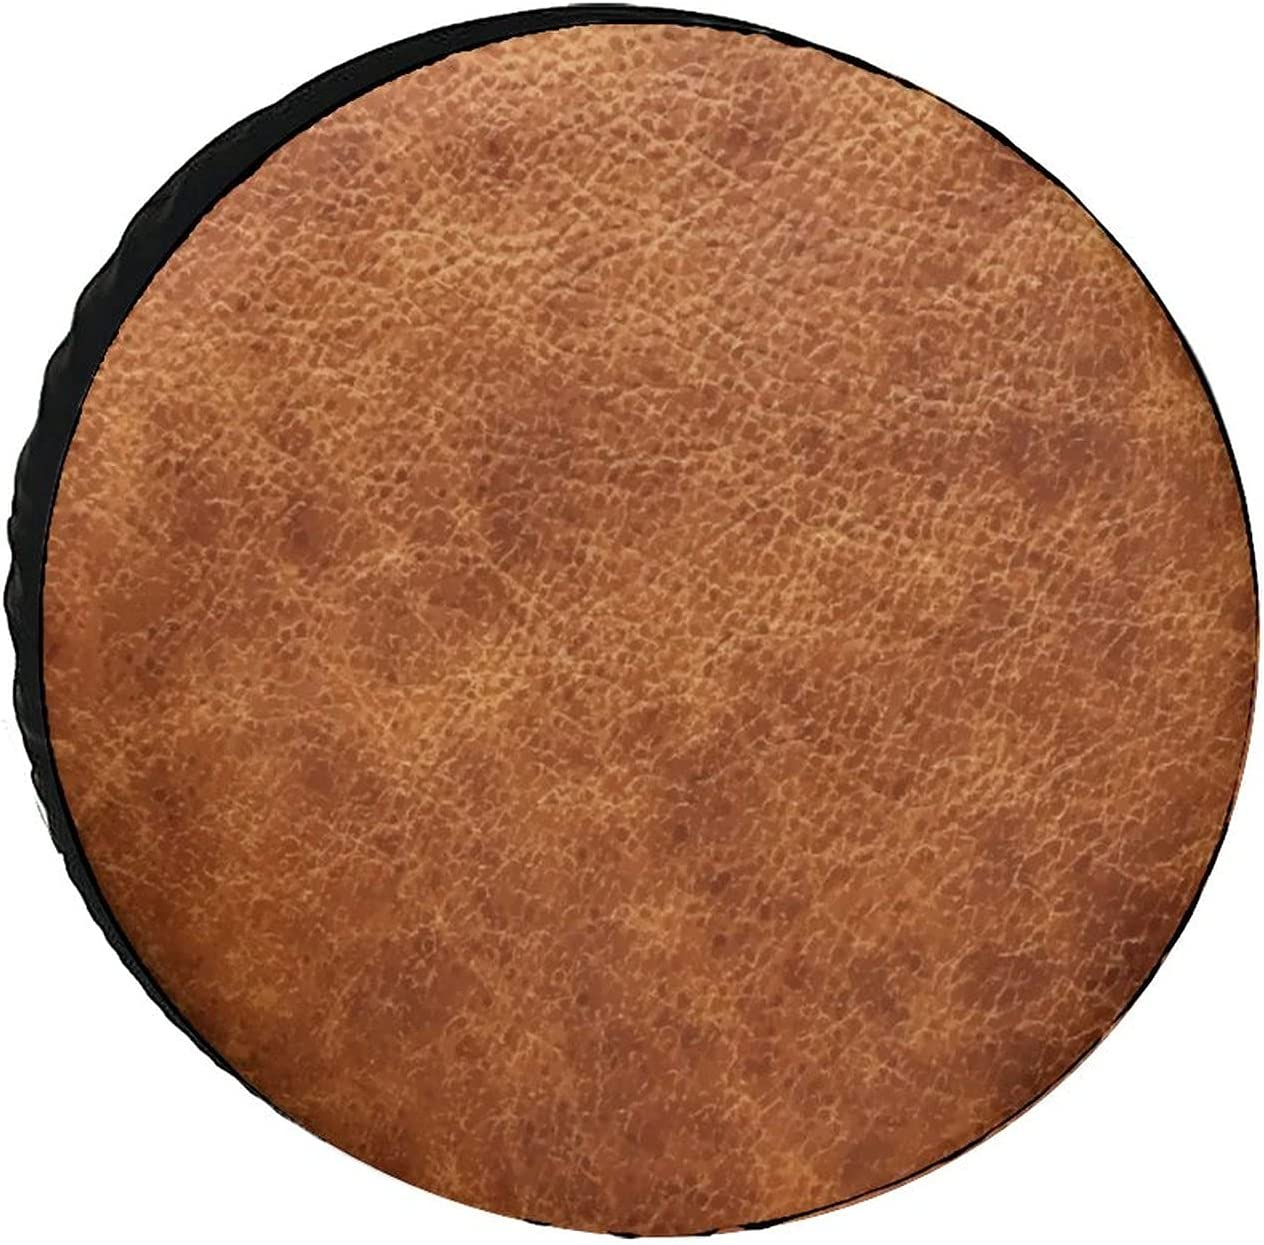 QUAVZI Japan's largest assortment Brown Vintage Faux Leather Pr Tire Background Deluxe Cover Wheel